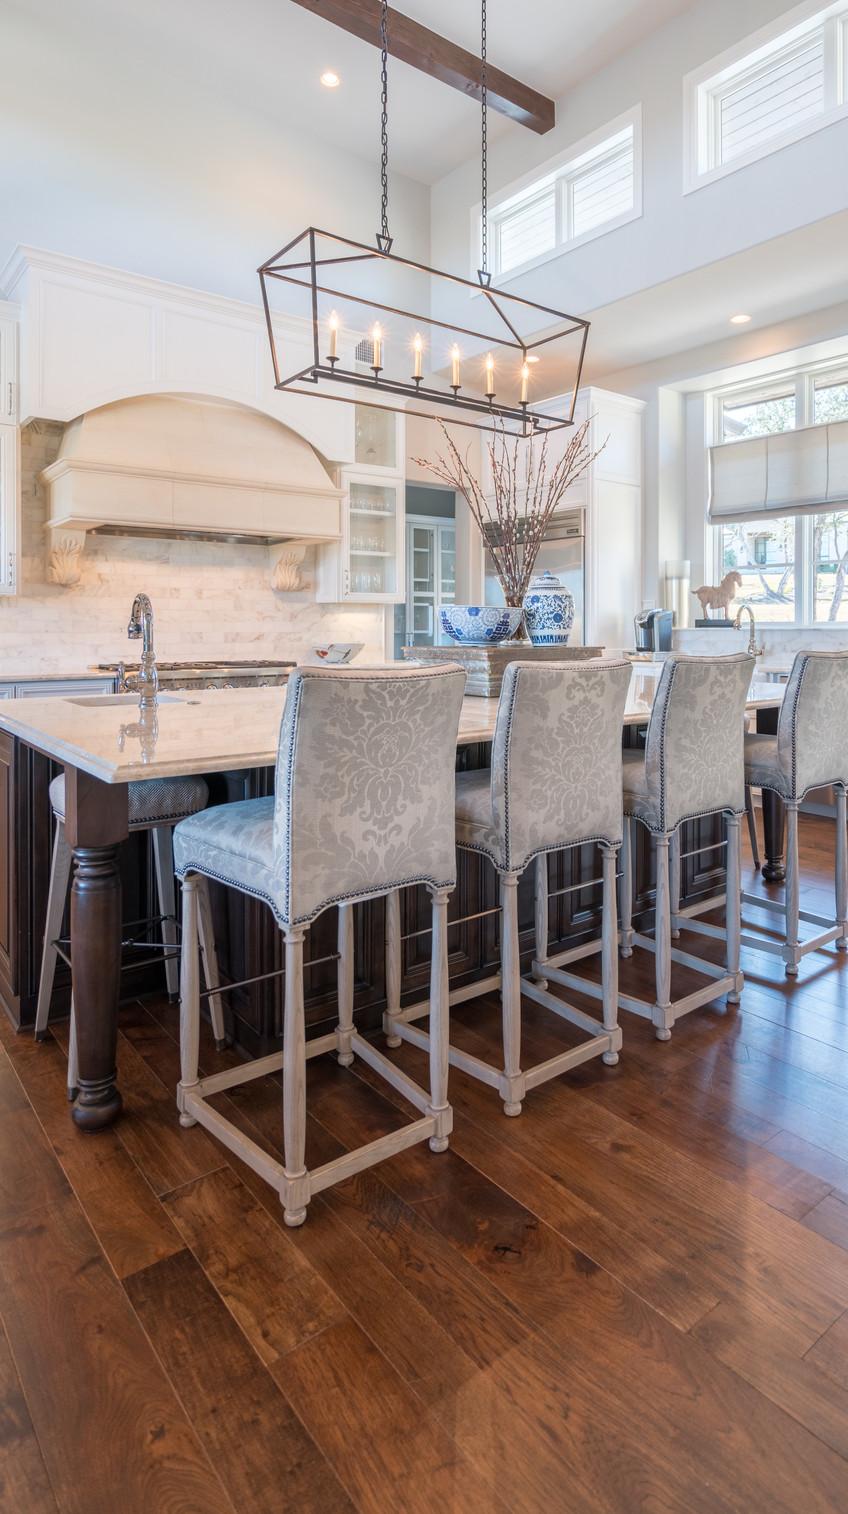 hardwood-design-company-2019-hardwood-flooring-trends-wide-plank-hardwood-flooring-southern-pecan-hardwood-flooring-satin-finish-hardwood-floors